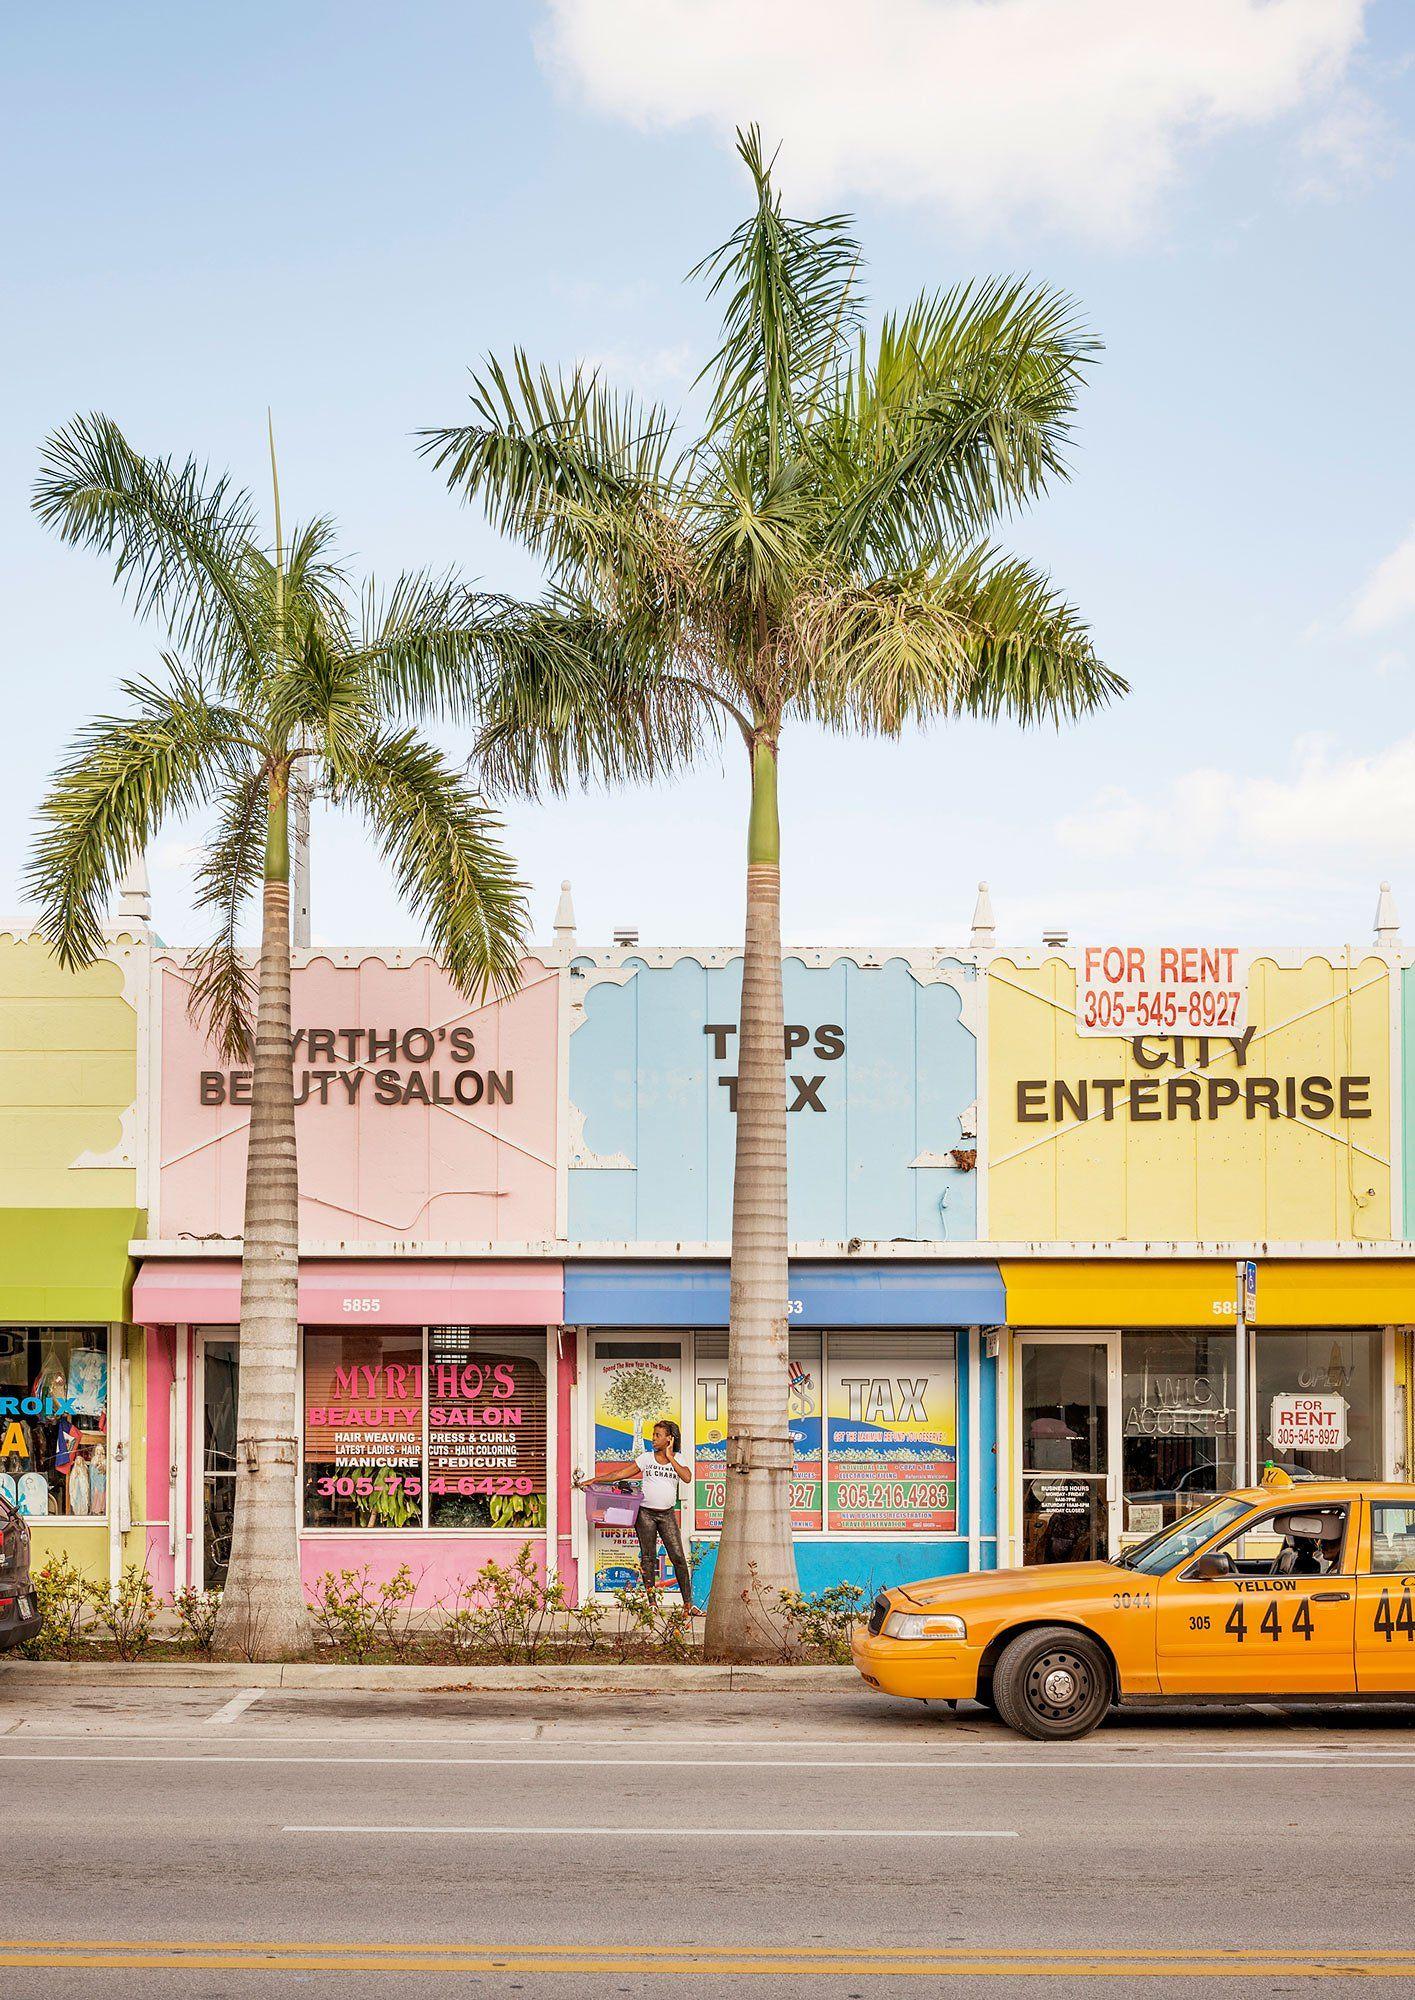 5 Hidden Gems To Visit During Art Basel In Miami S Little Haiti Neighborhood